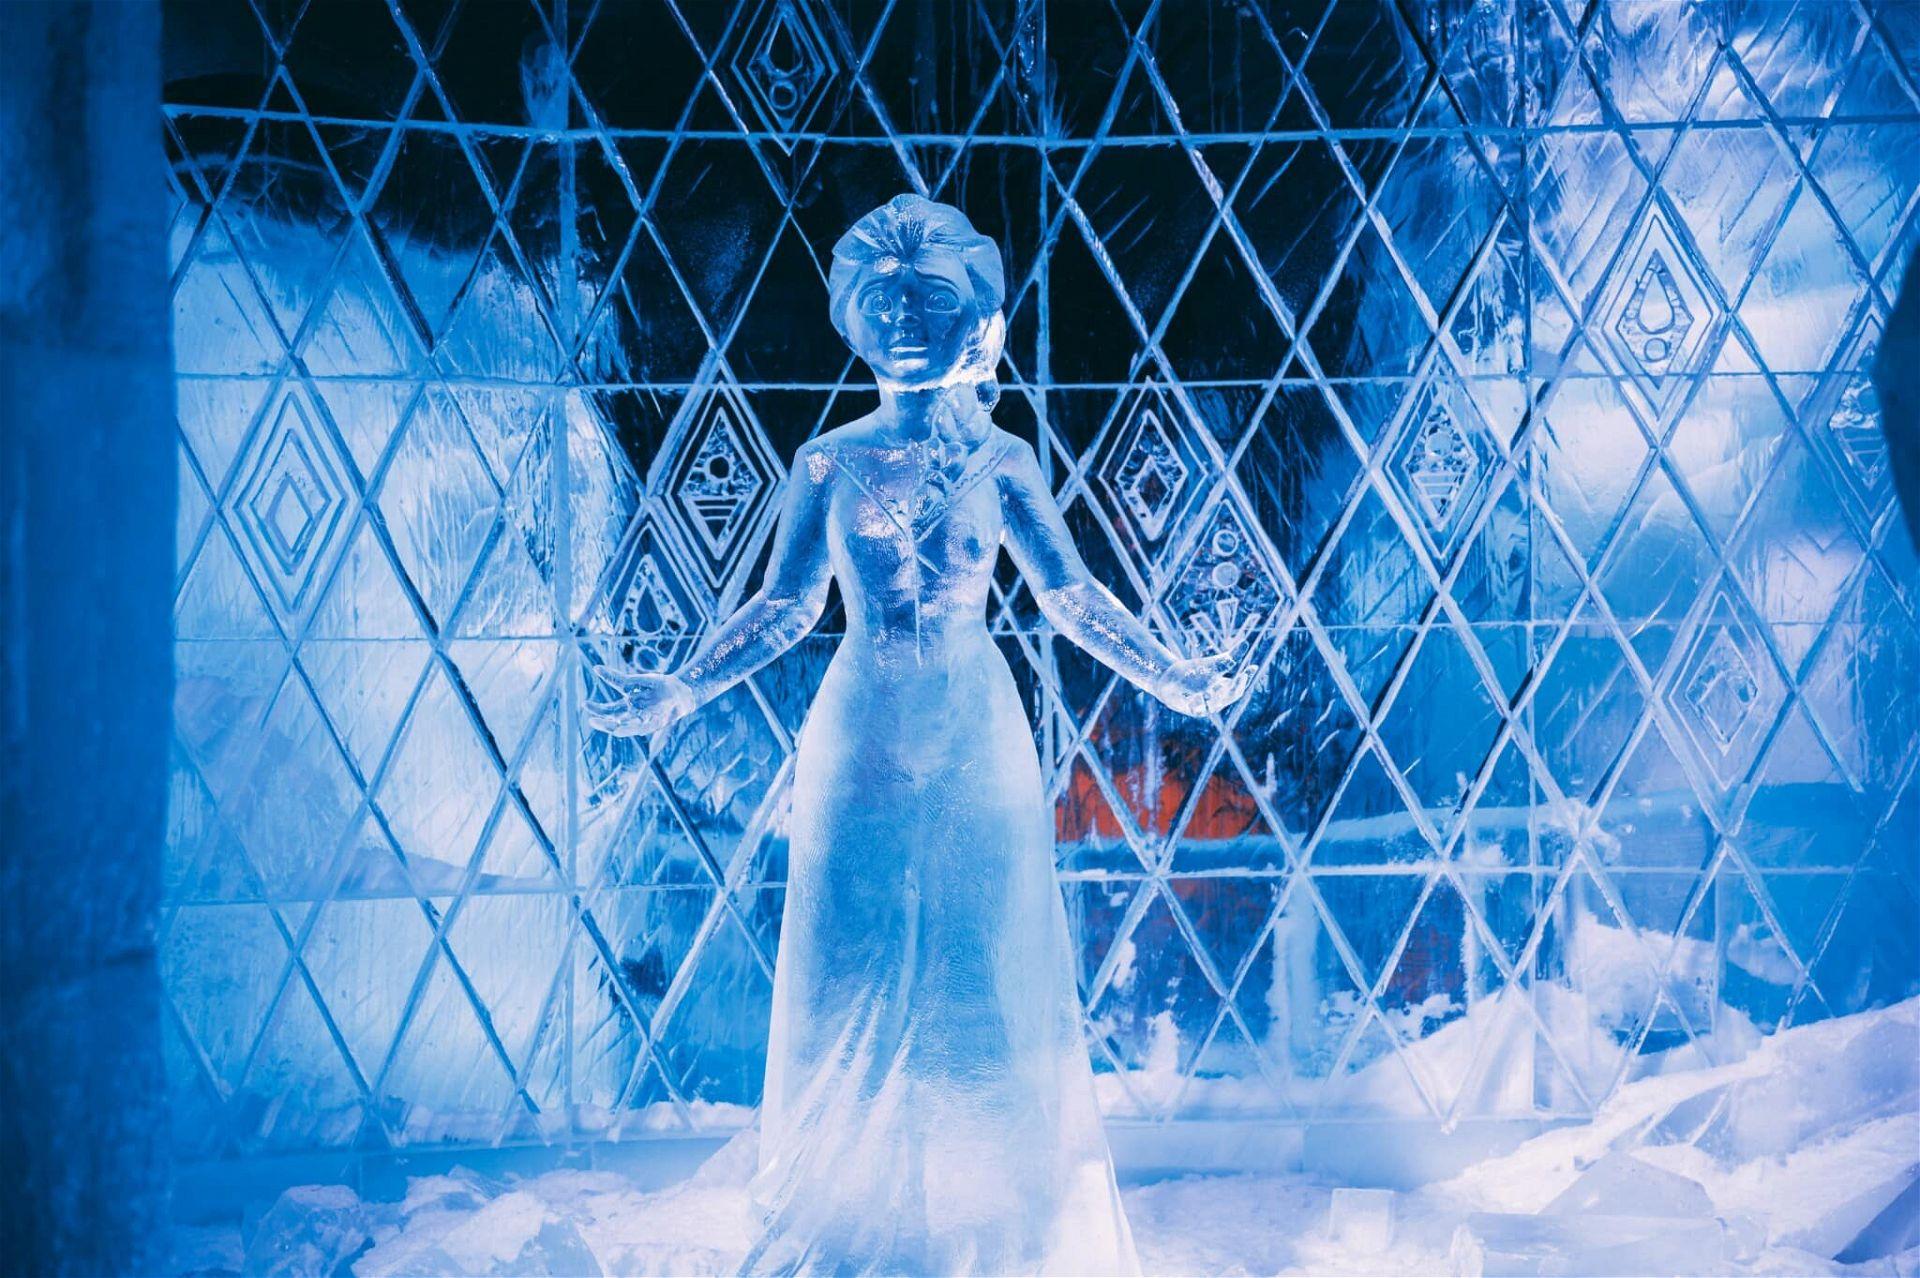 Elsa die Eiskoenigin